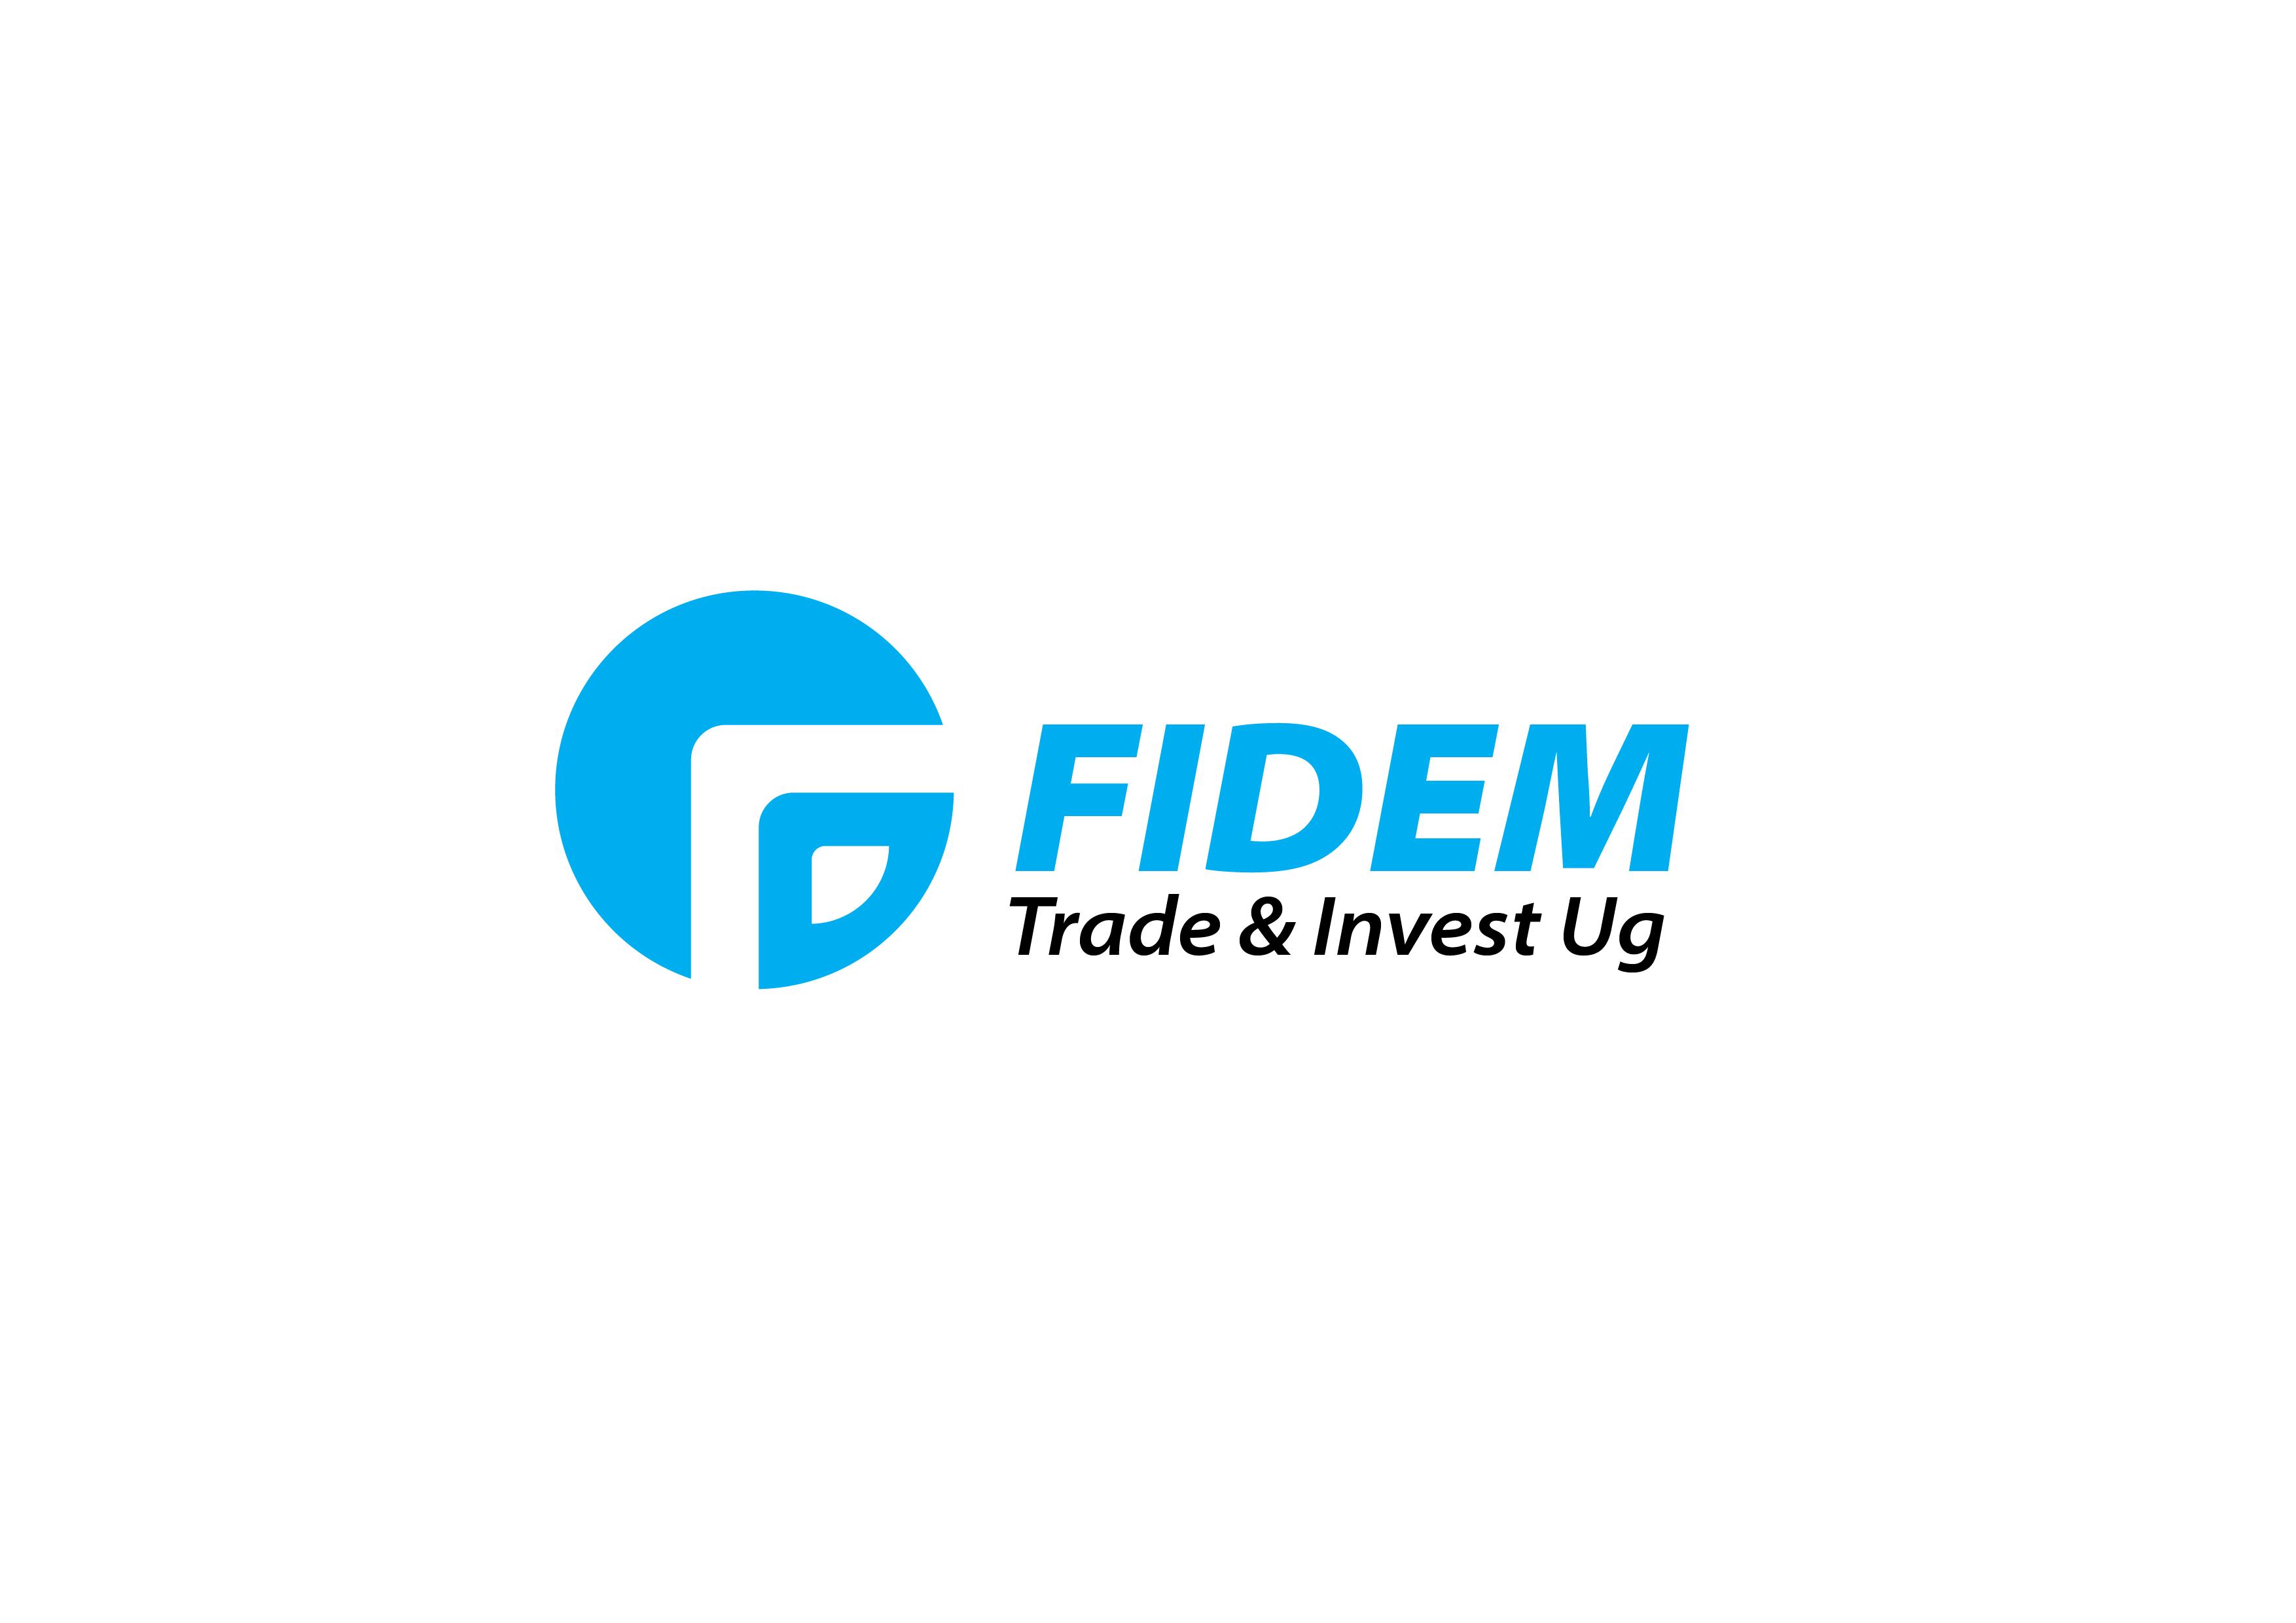 Logo Design by 3draw - Entry No. 317 in the Logo Design Contest Professional Logo Design for FIDEM Trade & Invest UG.